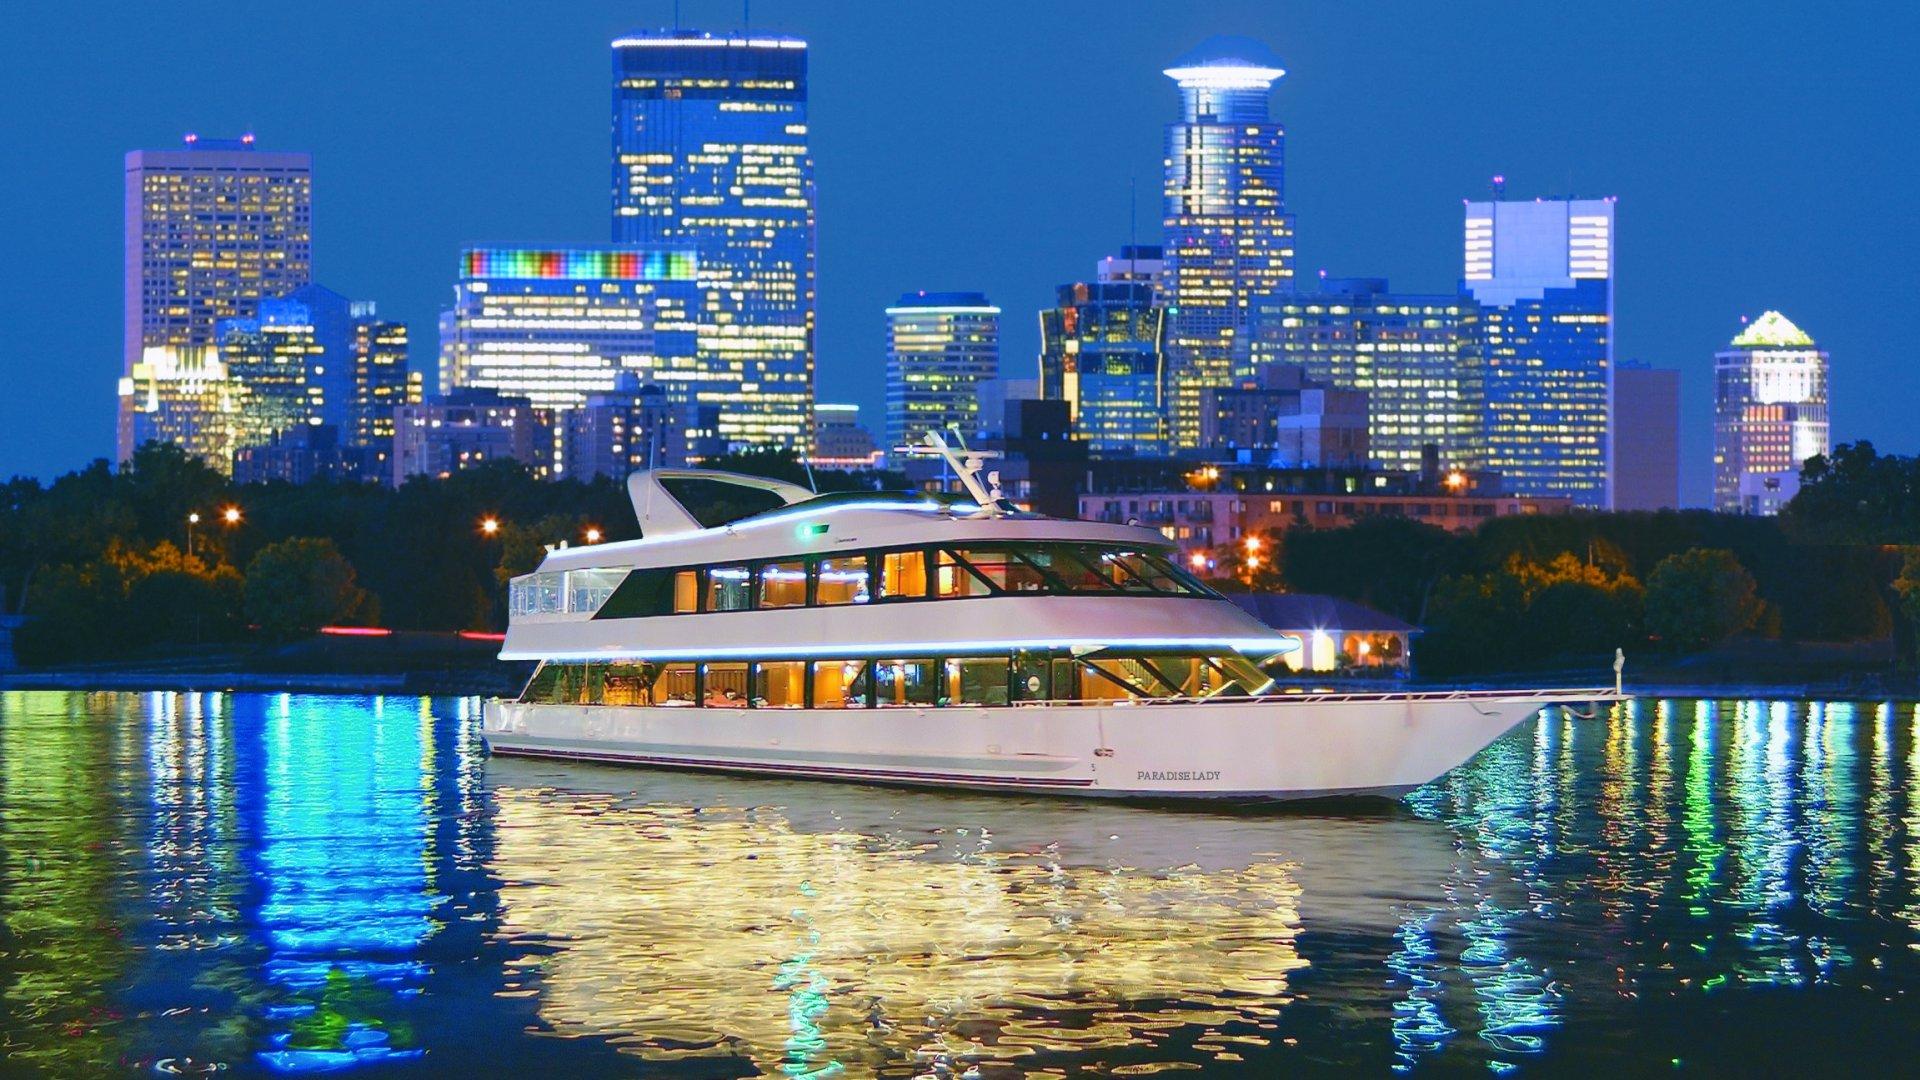 Paradise Charter Boat